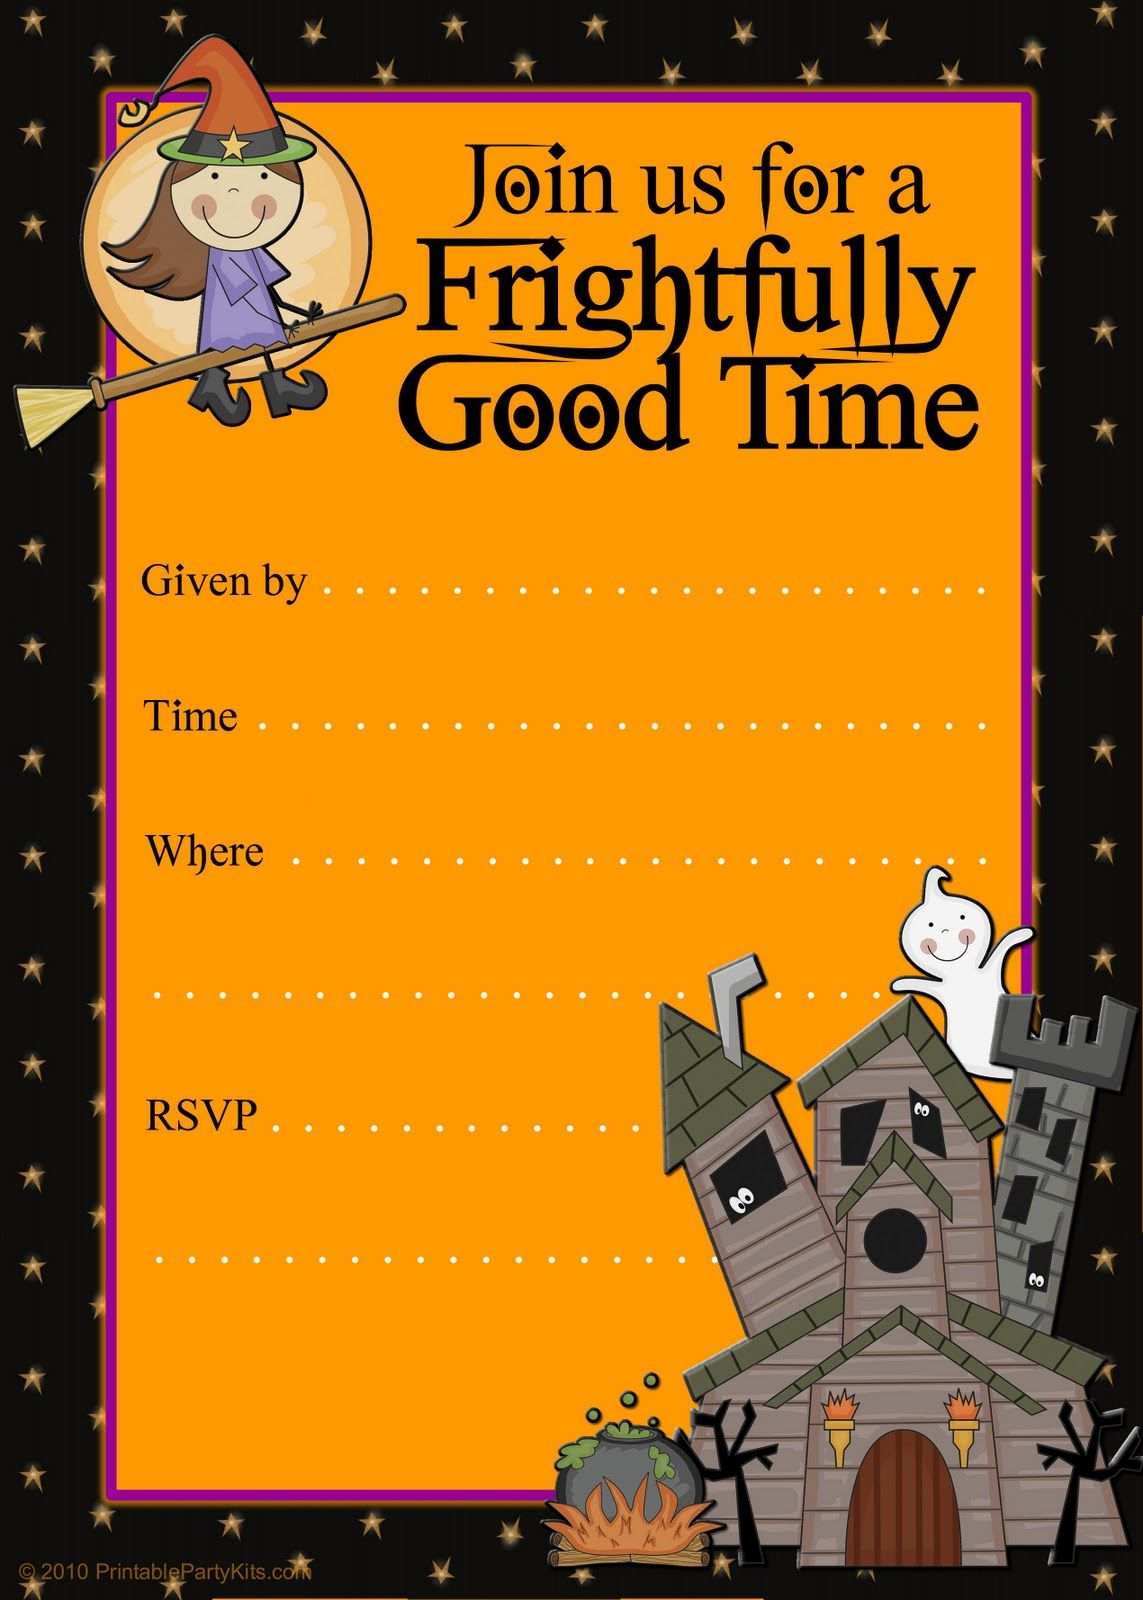 Free Halloween Flyer Invitations Printable | Food | Pinterest - Free Printable Halloween Flyer Templates